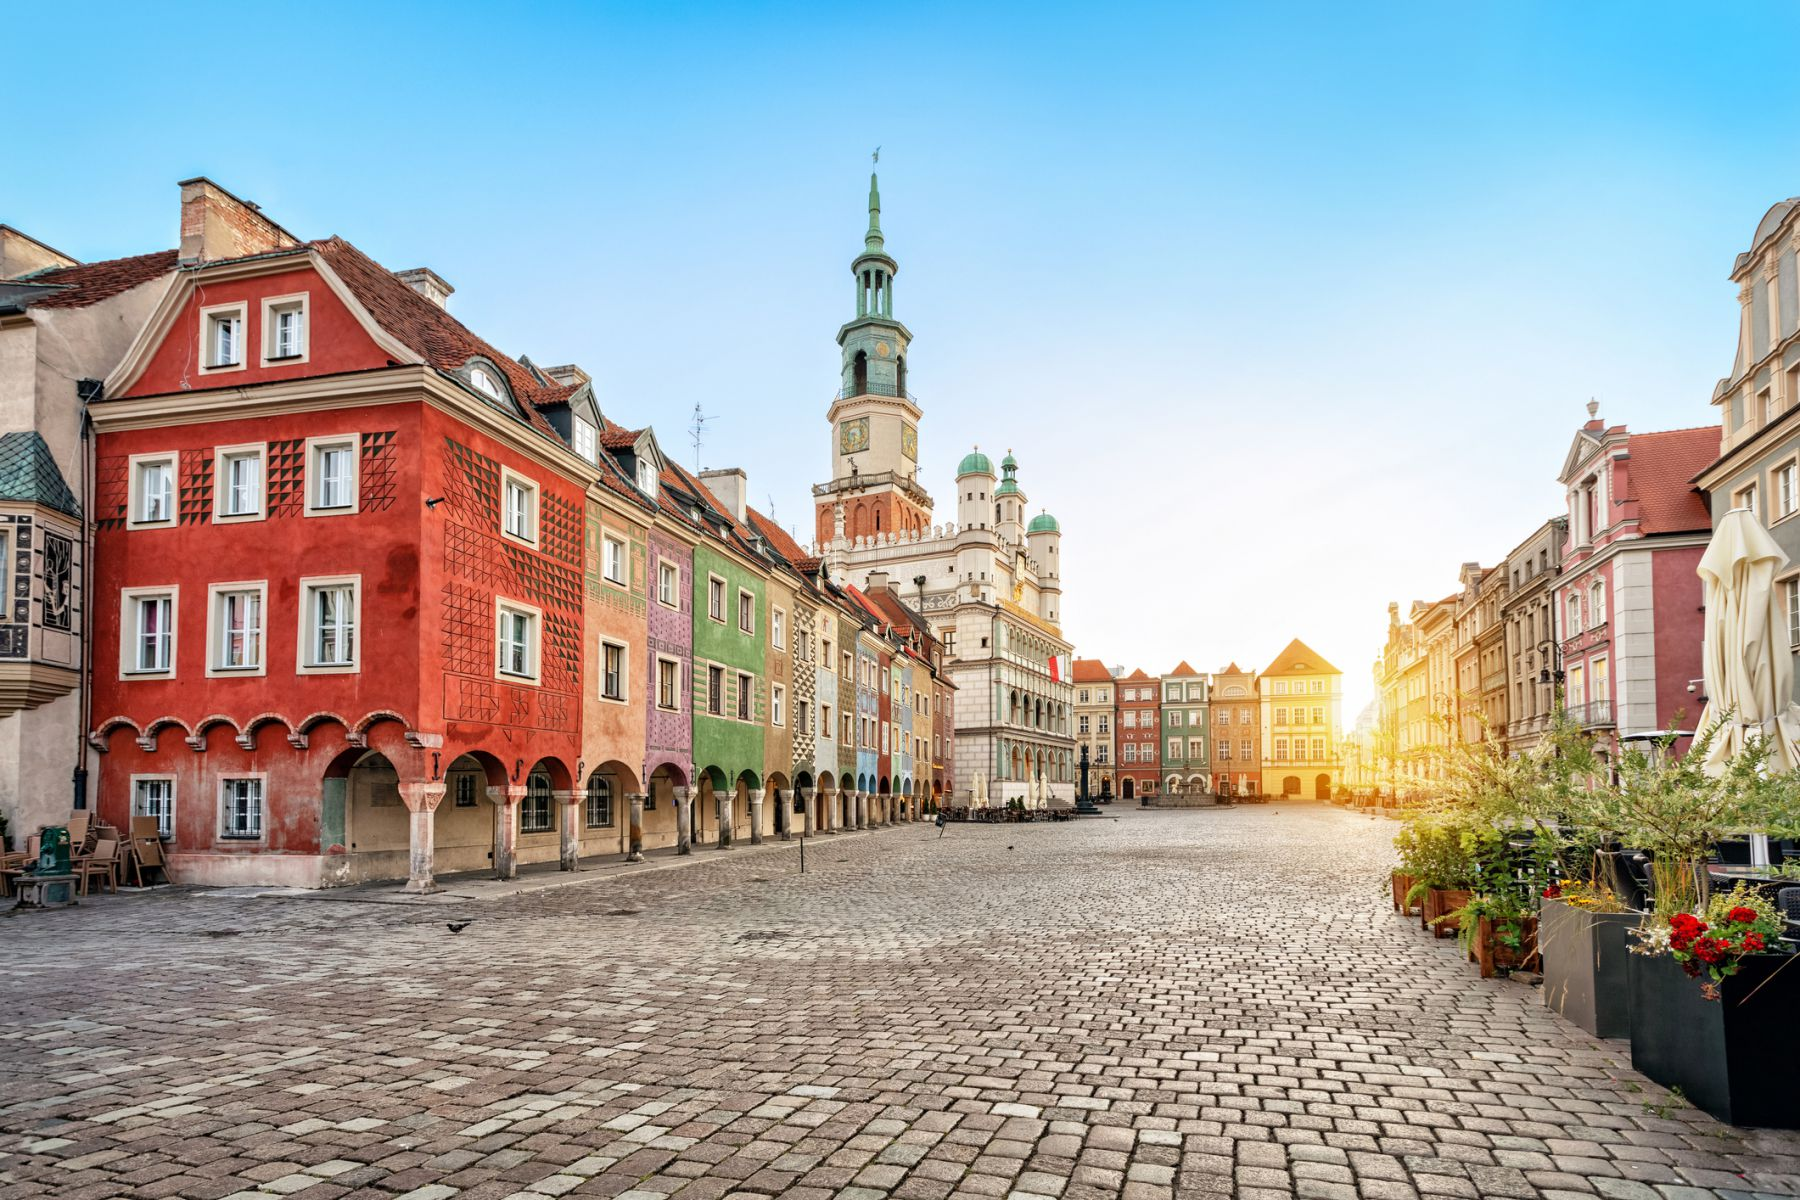 Stary Rynek, het oude centrum van Poznań | credit: bbsferrari (iStock)